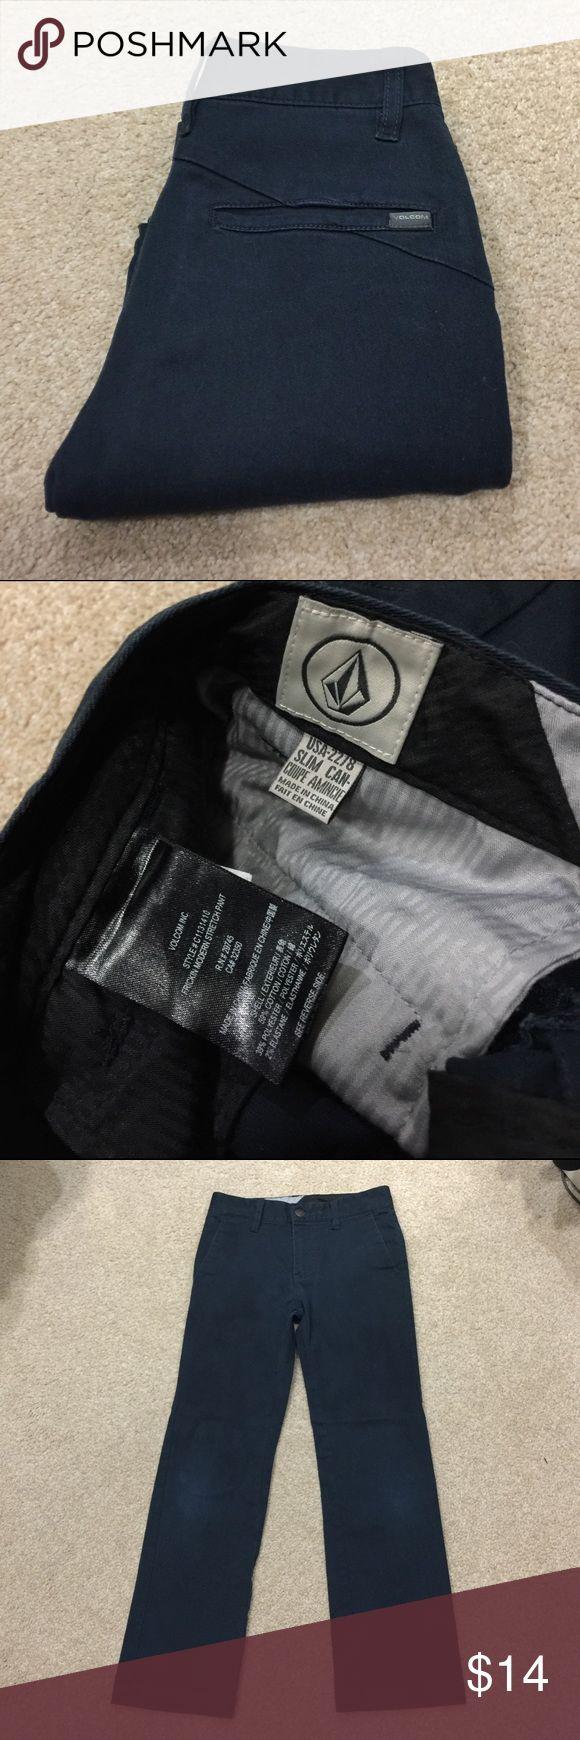 "Boy's VOLCOM Pants Boy's Dark Blue, VOLCOM Pants, Size 22/8. ""Fricken Modern Stretch Pant."" Cotton Blend. Good condition.   20% off 3+ items in my closet  Bundle & Save! Volcom Bottoms Casual"